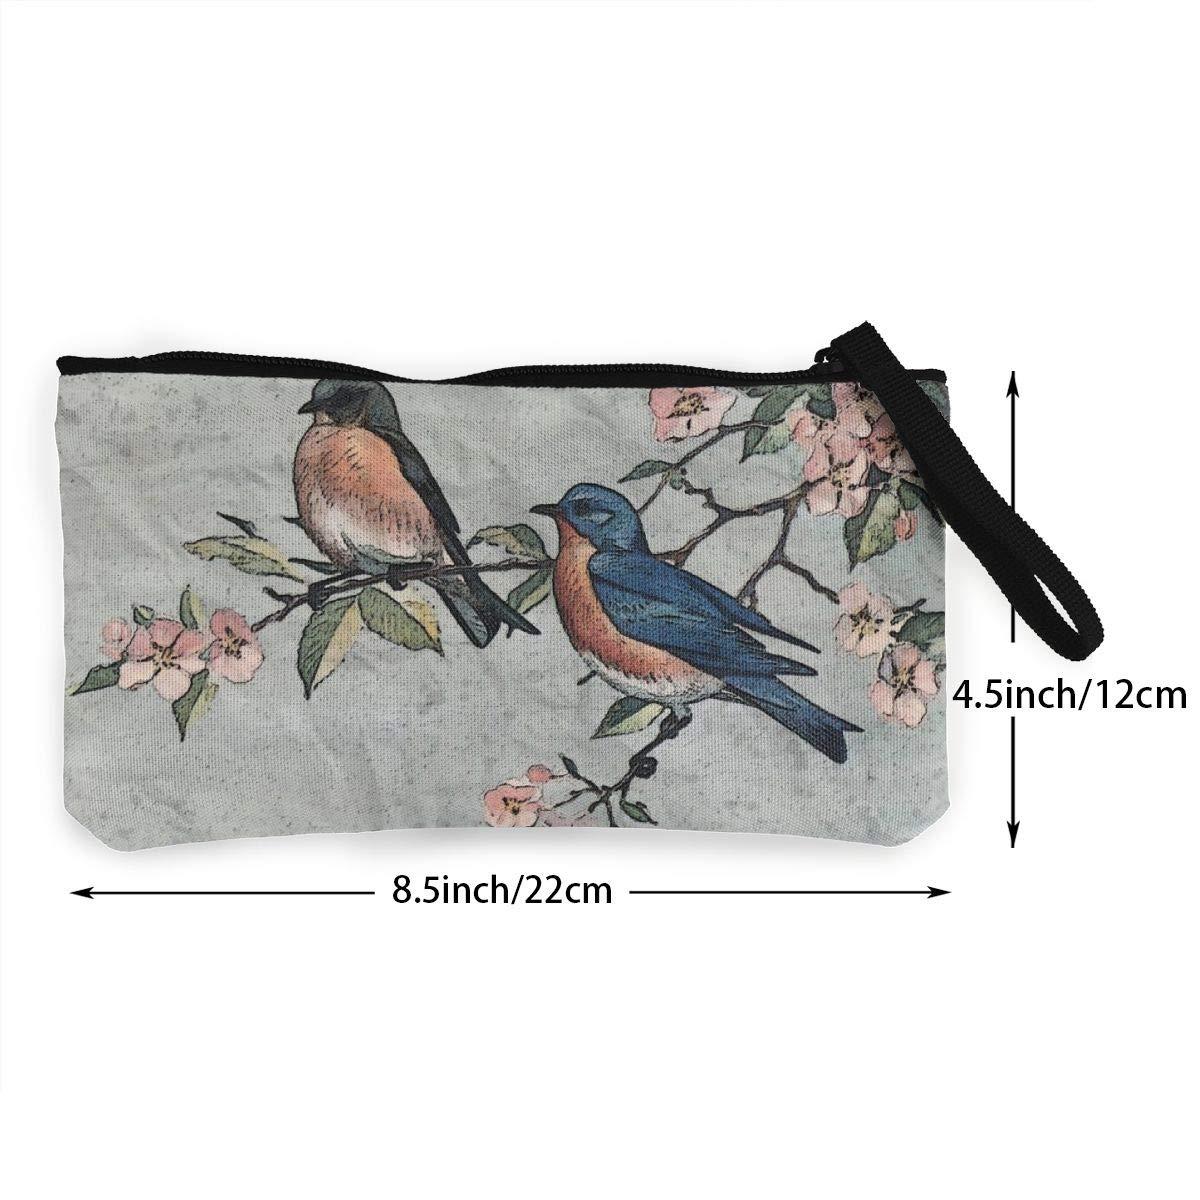 Make Up Bag,Cellphone Bag With Handle Eastern Bluebirds Wildlife Zipper Canvas Coin Purse Wallet